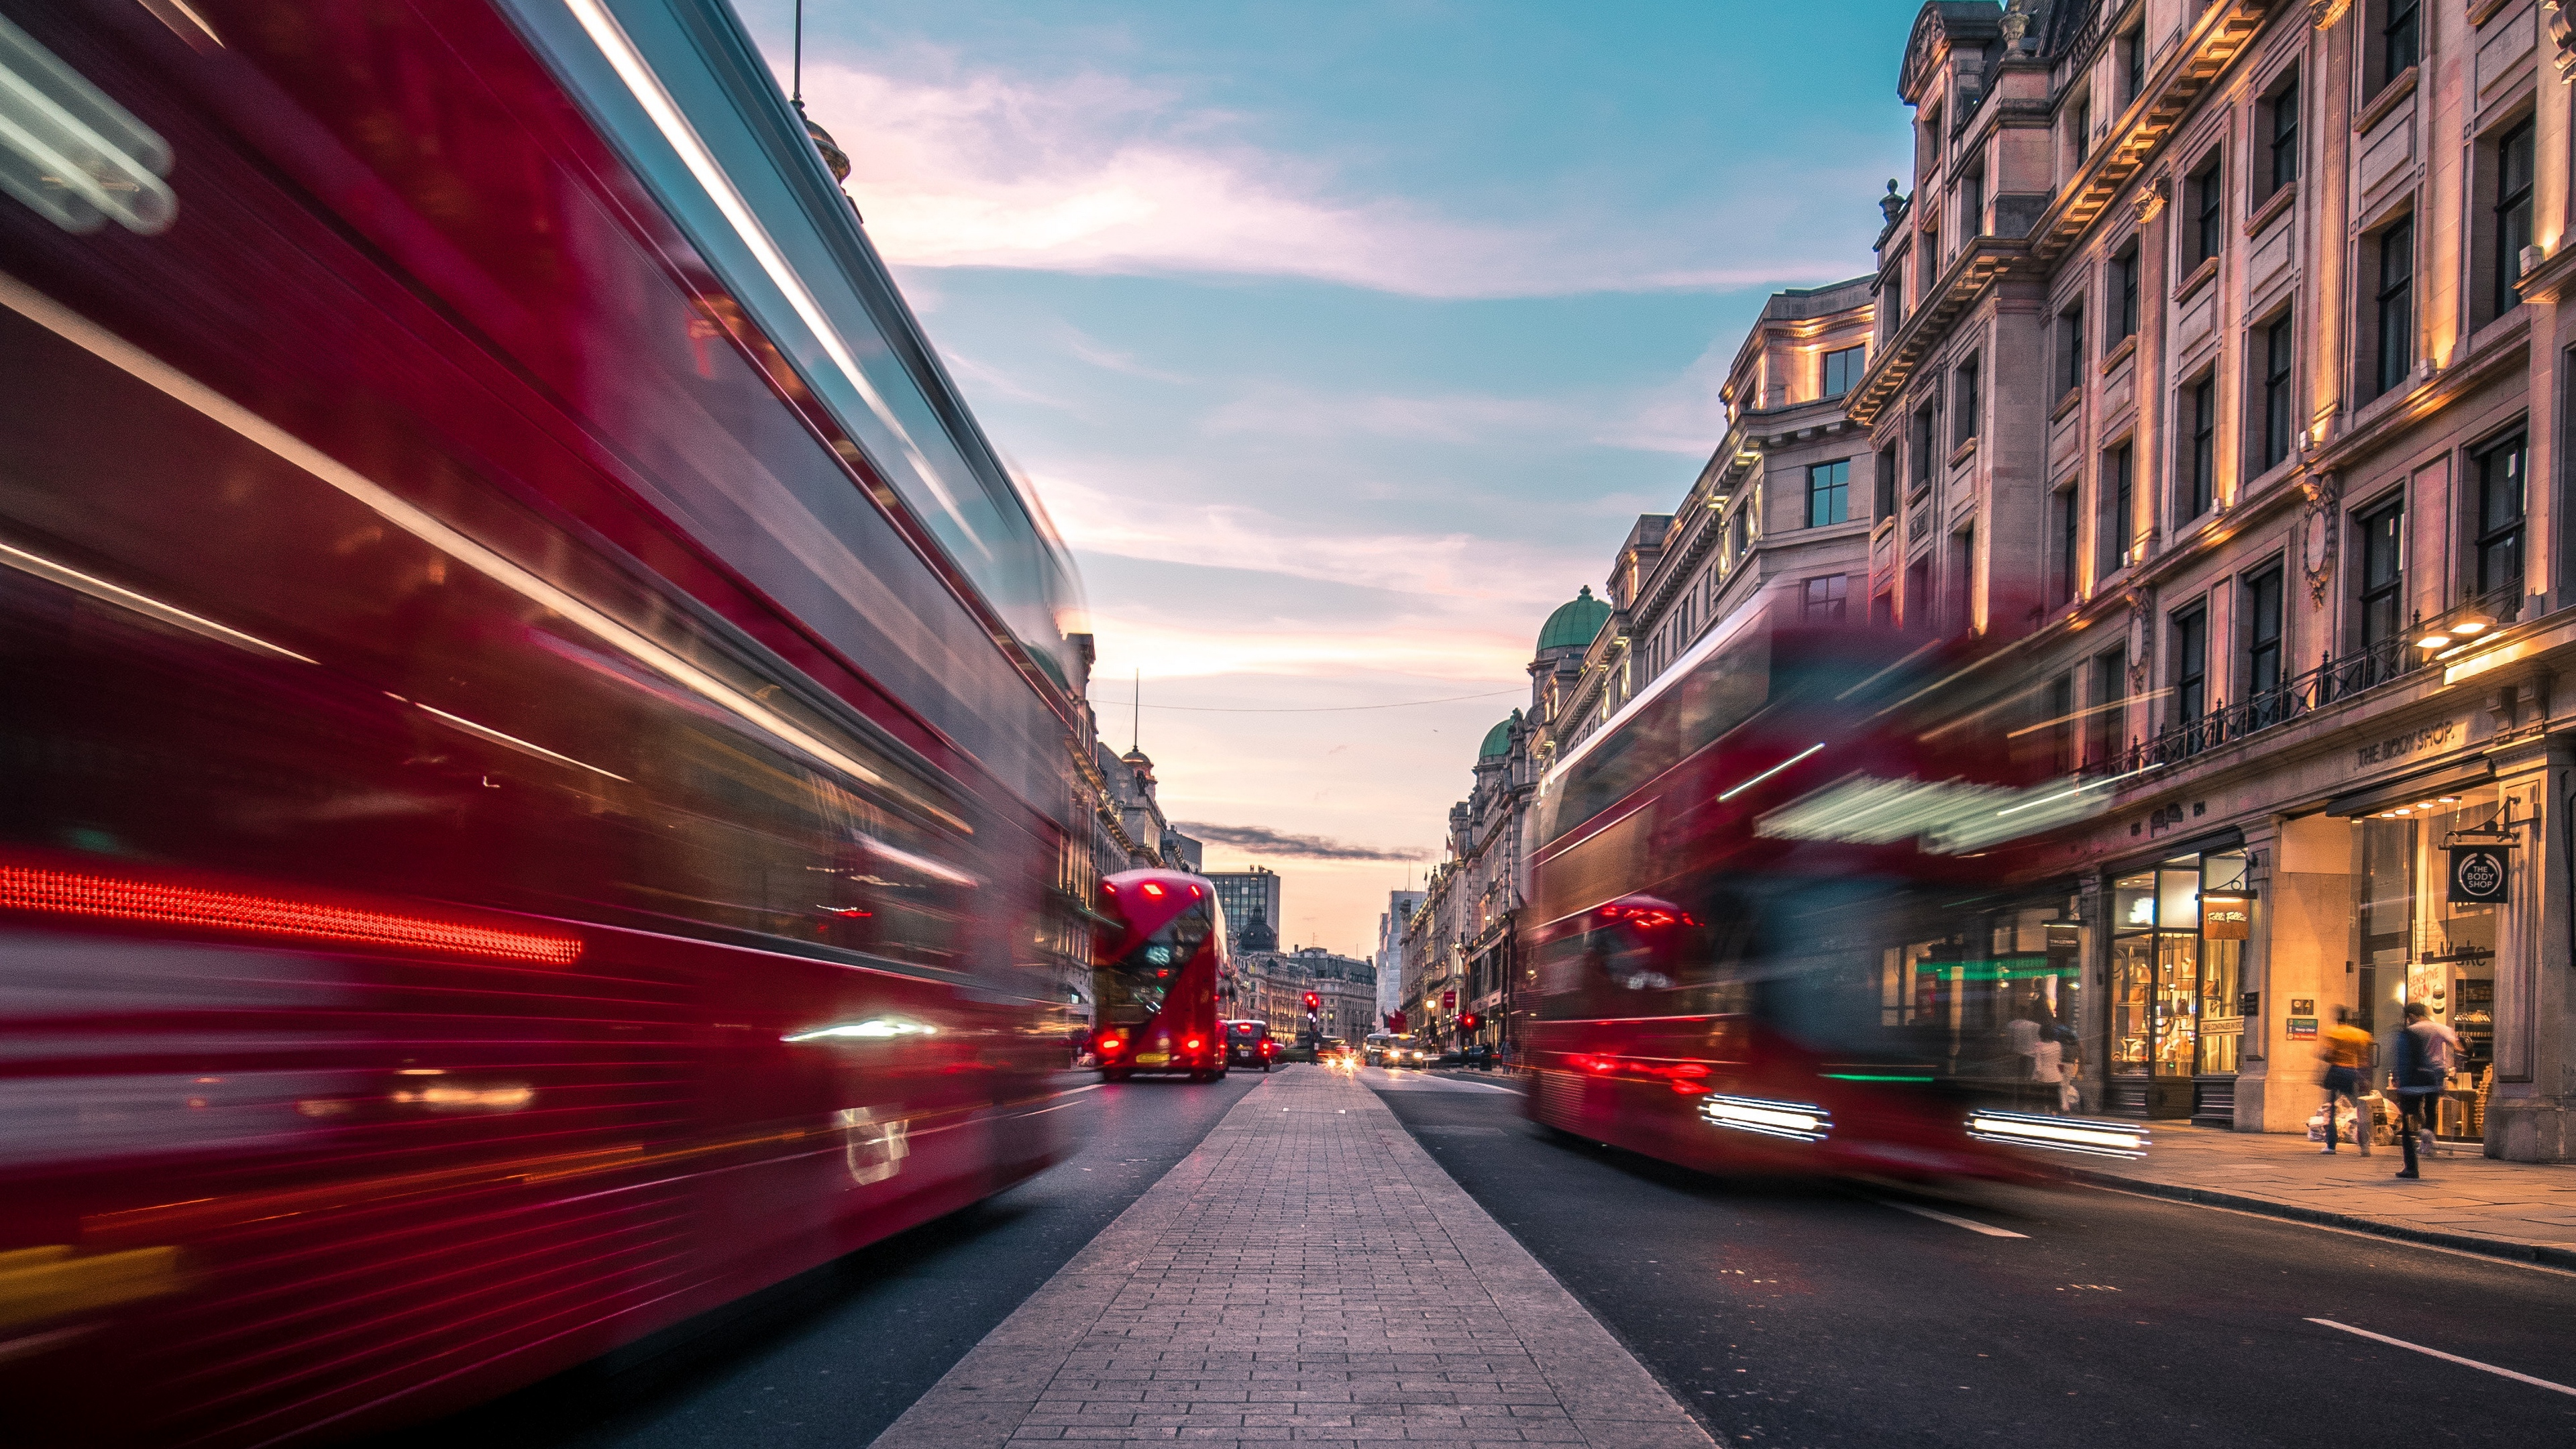 buses speed traffic street london united kingdom 4k 1538066740 - buses, speed, traffic, street, london, united kingdom 4k - Traffic, speed, buses